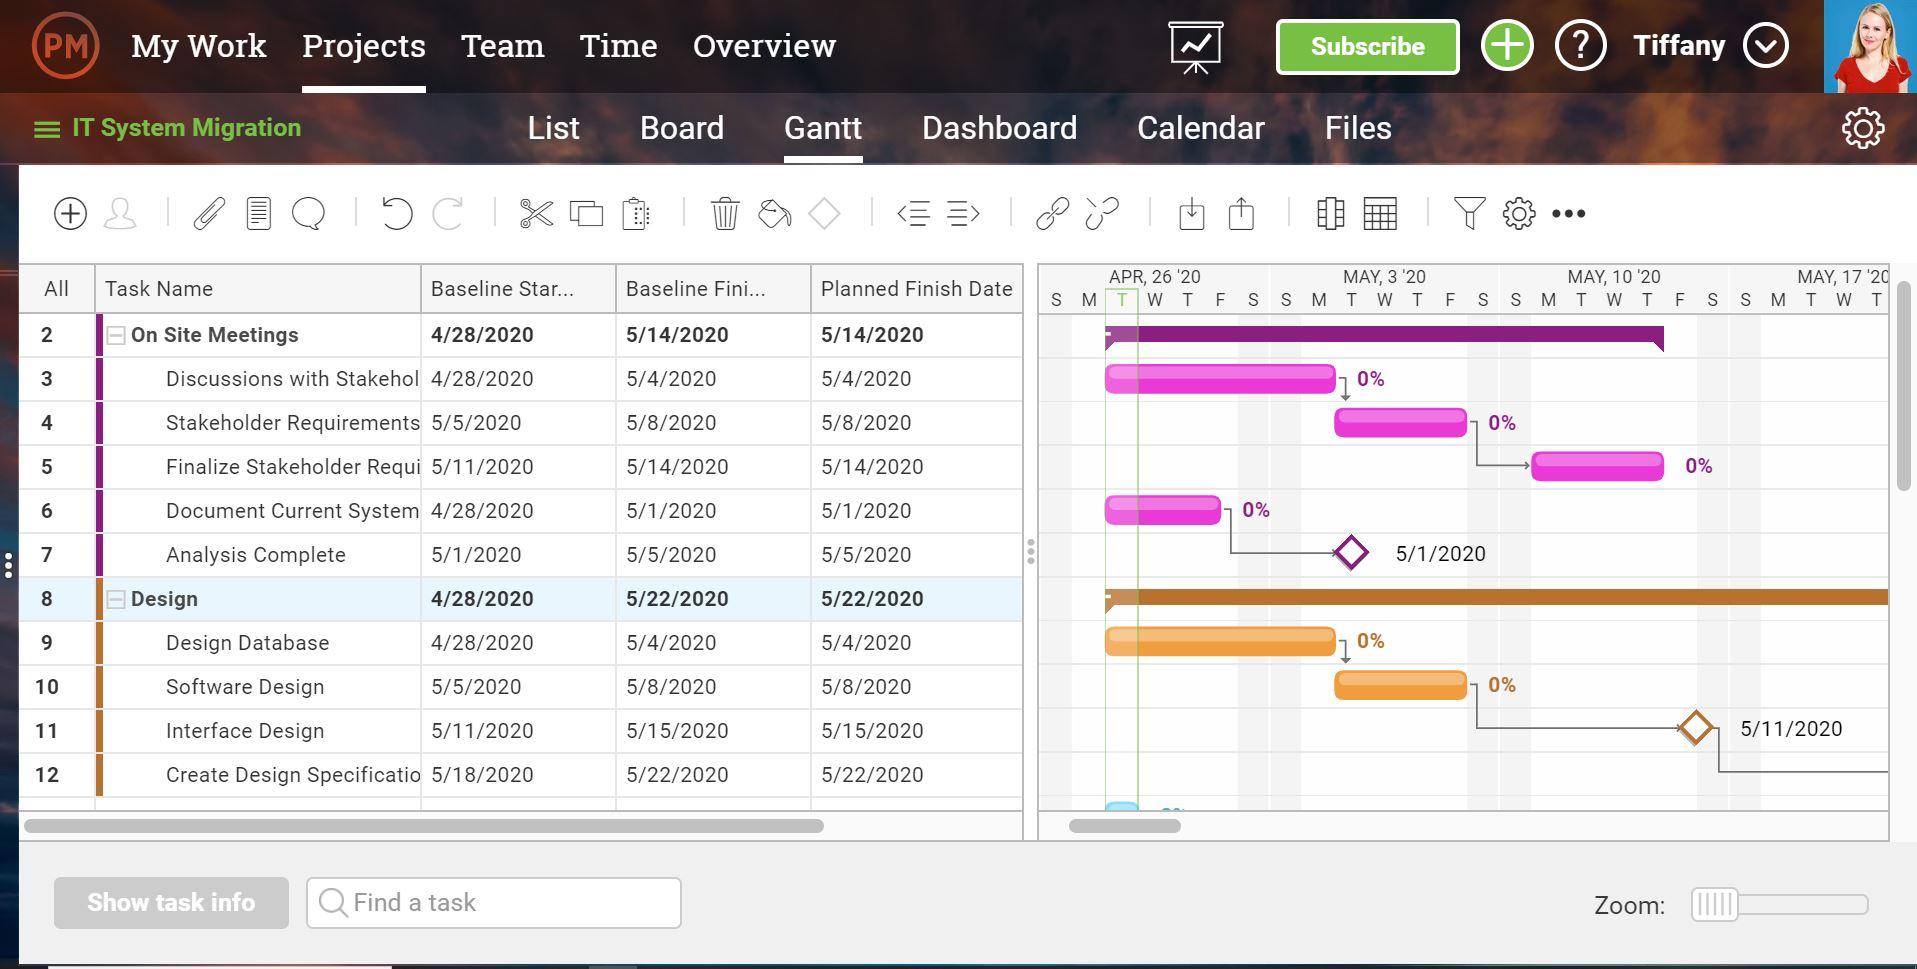 projectmanager.com diagrama de gantt para planes de proyecto